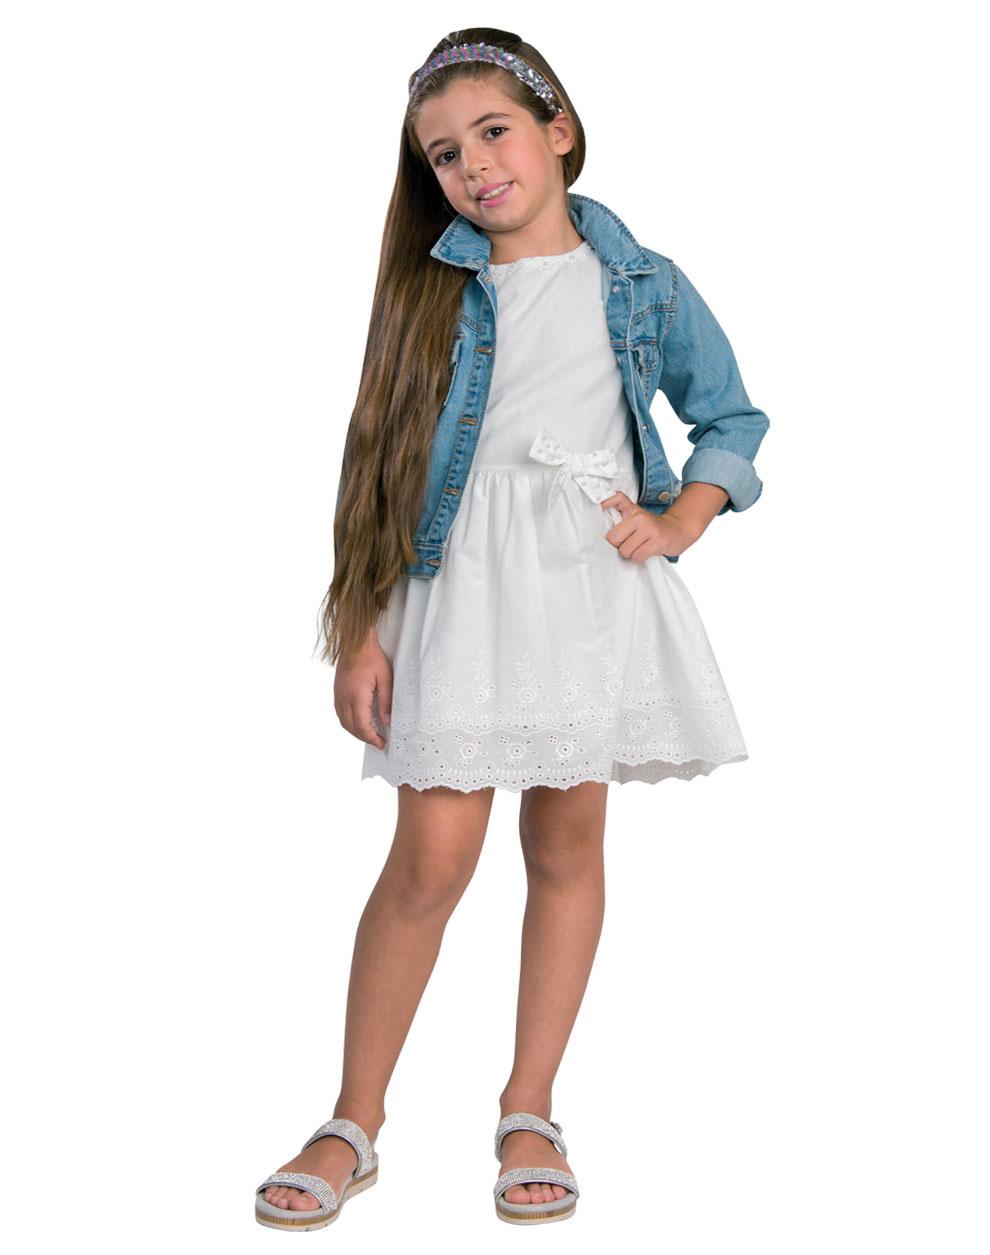 5ab36d176cf0 Φόρεμα με δαντέλα μπροντερί